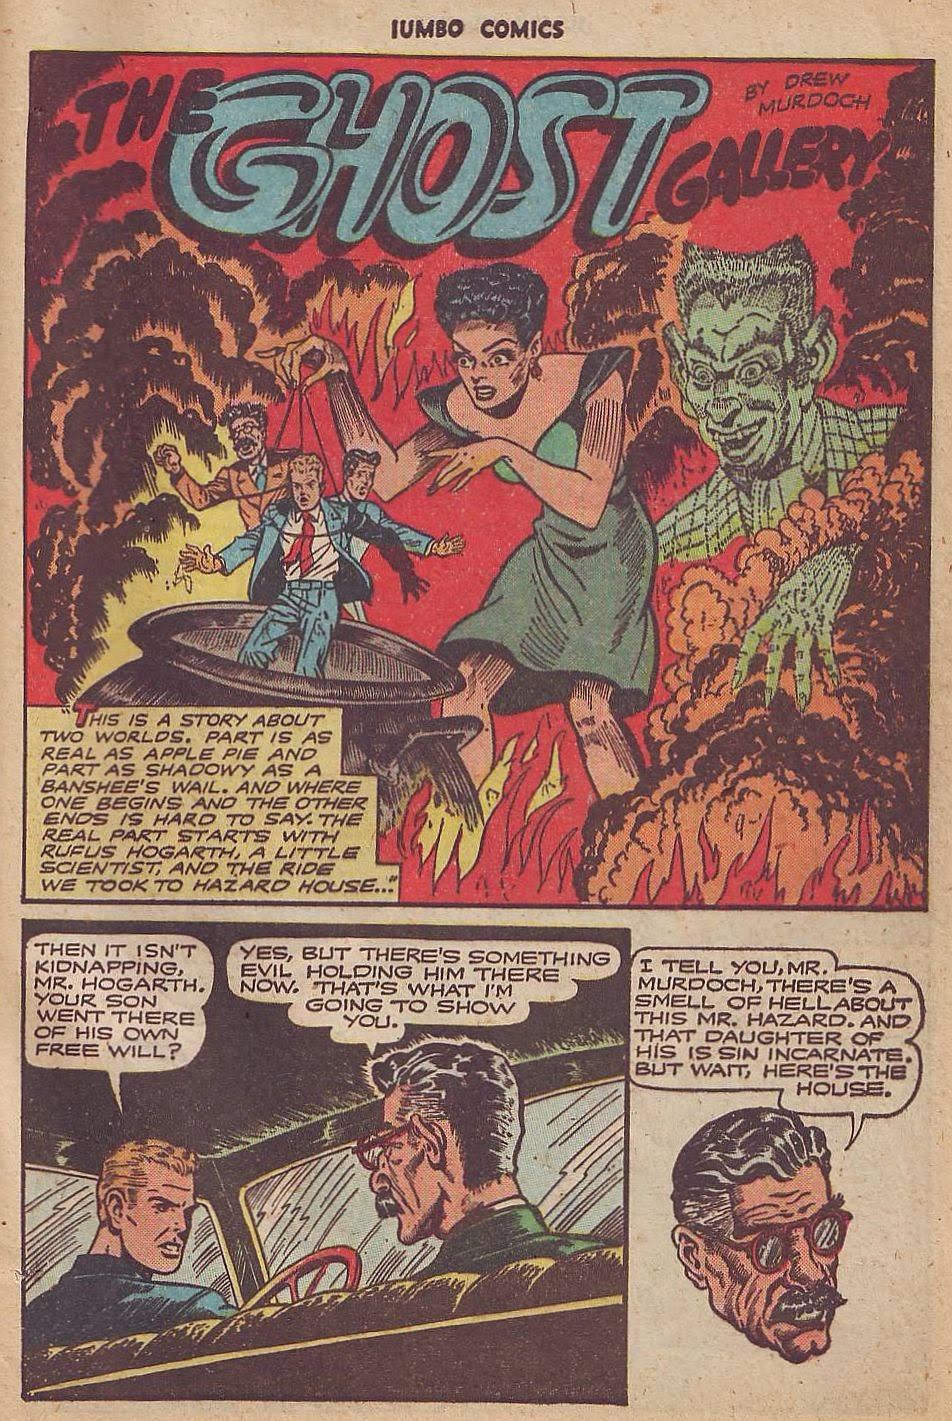 Jumbo_Comics_099_43-GhostGallery.jpg